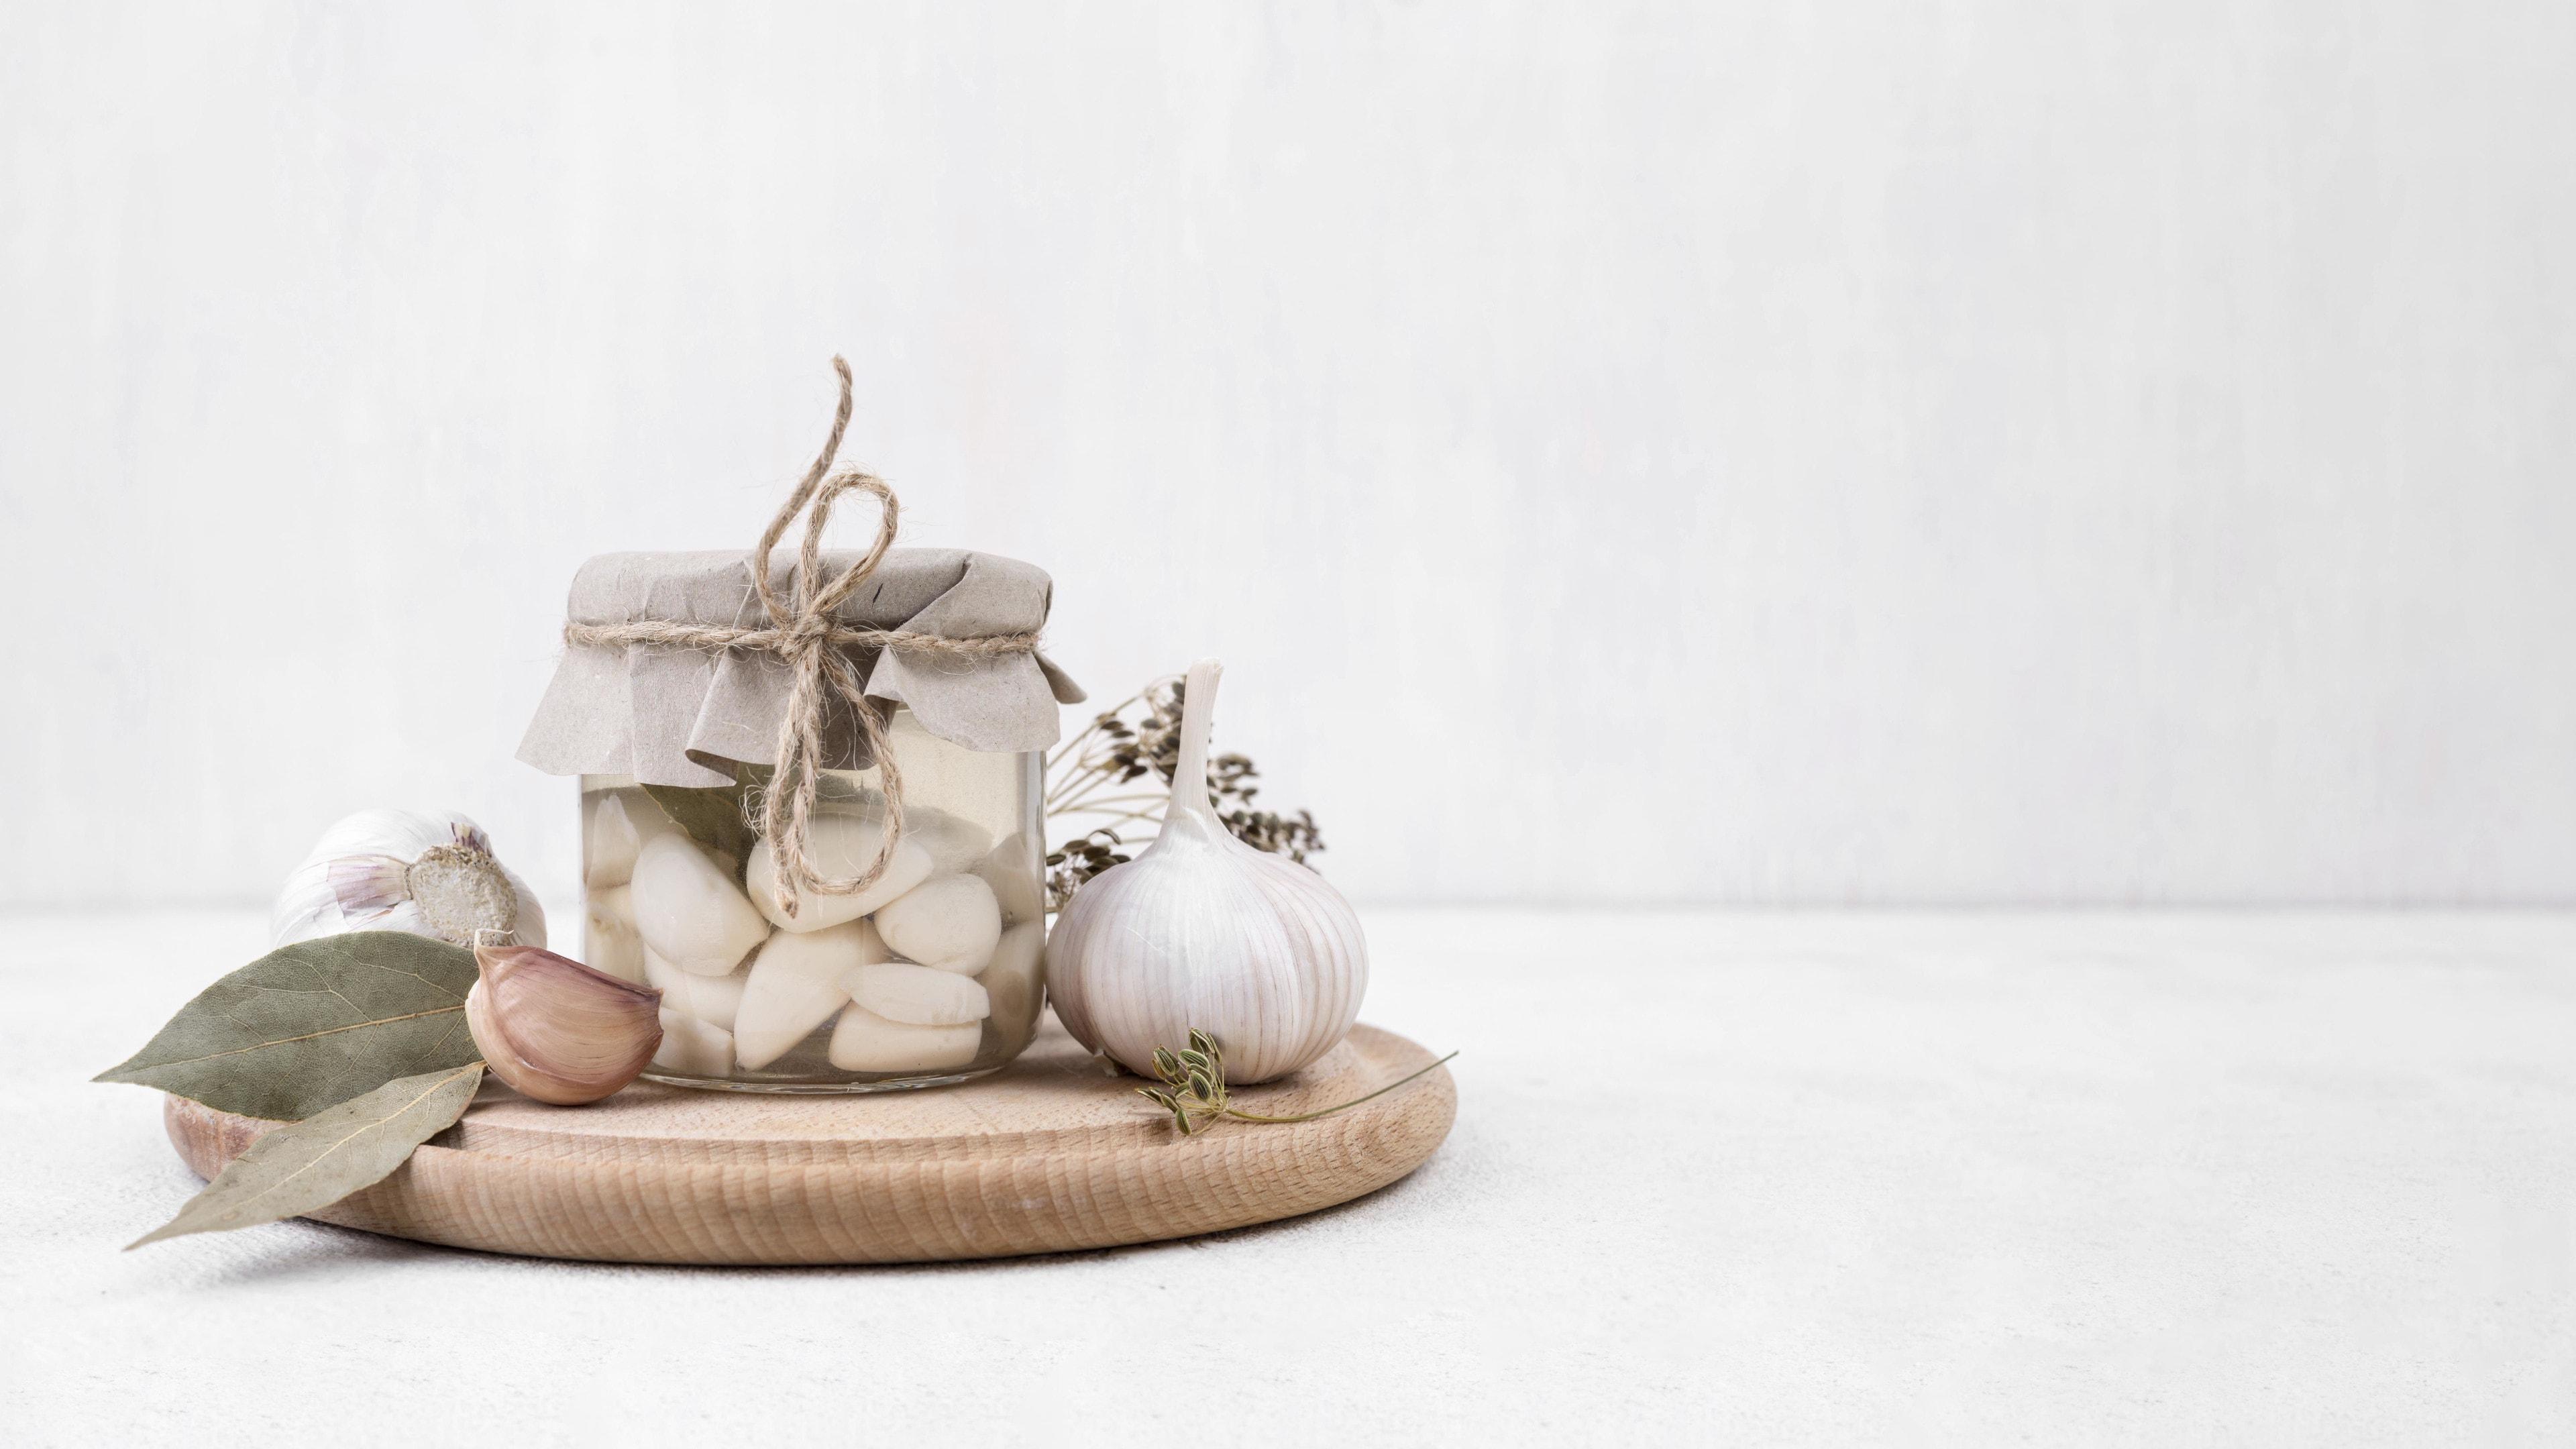 Garlic cloves with jar of peeled garlic